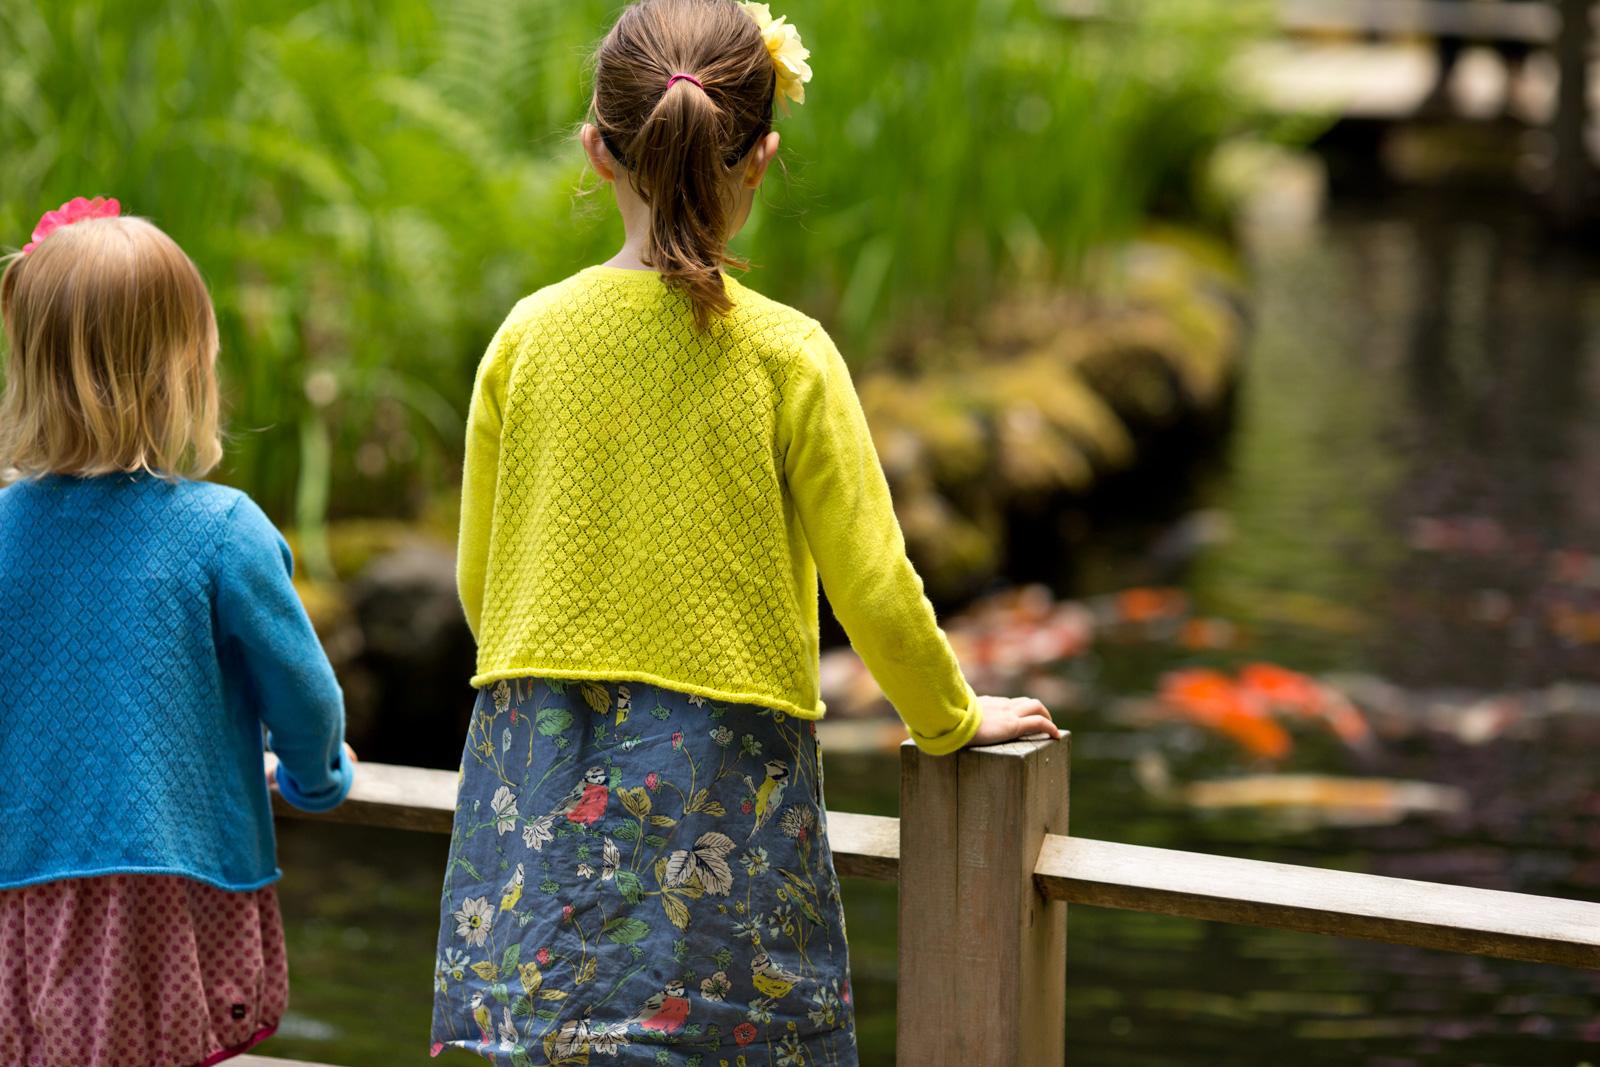 childrens day kodomo no hi � portland japanese garden